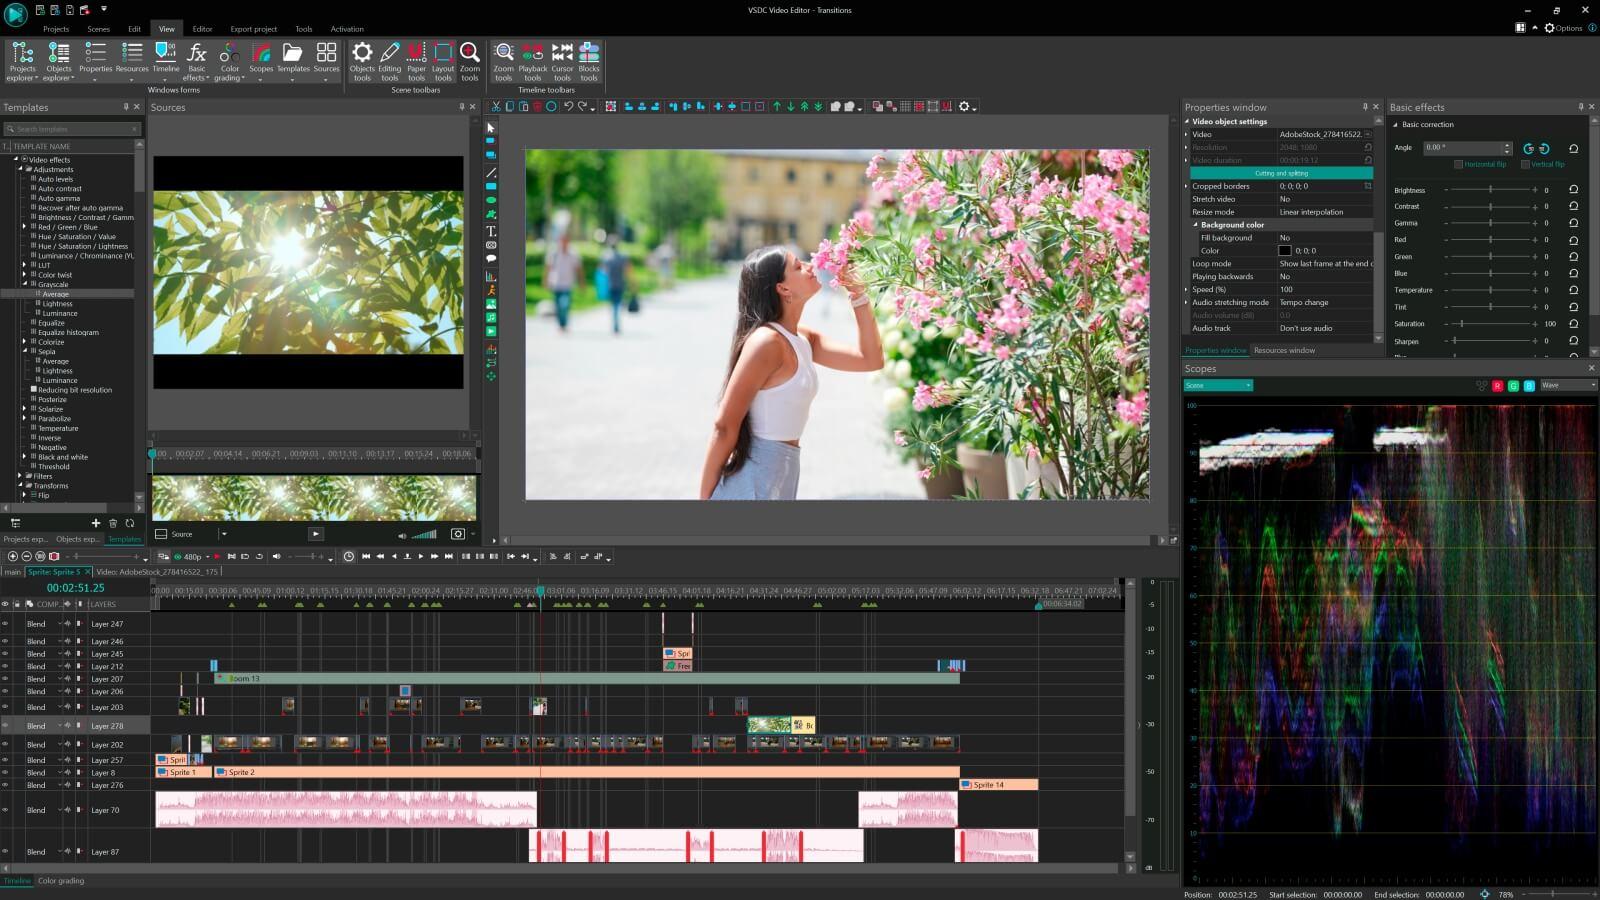 https://www.videosoftdev.com/images/video_editor/screenshots/1.jpg